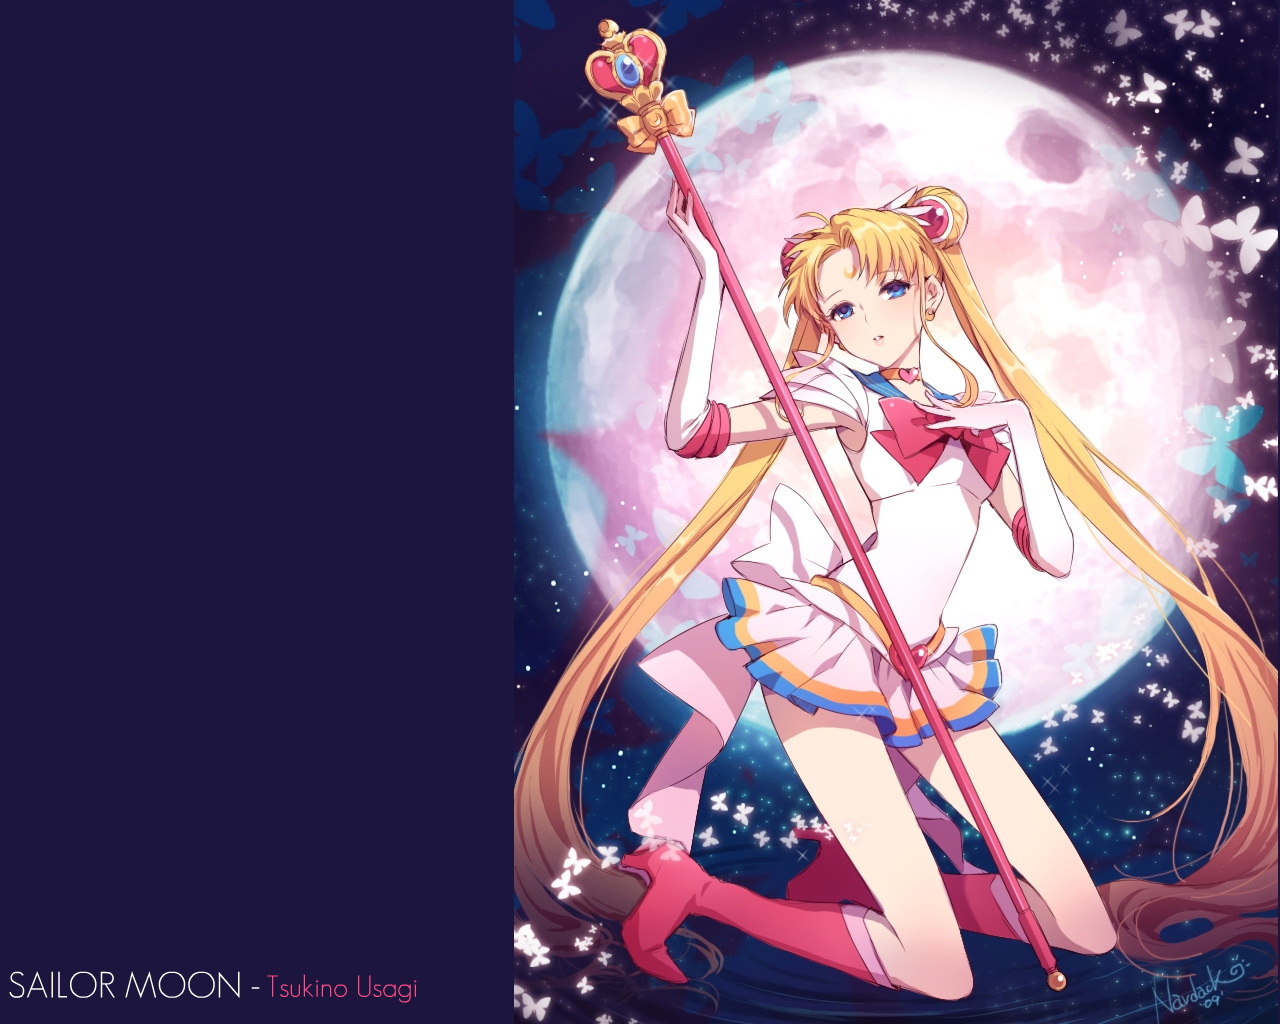 Sailor Moon Characters Wallpaper 1280x1024 Full HD Wallpapers 1280x1024